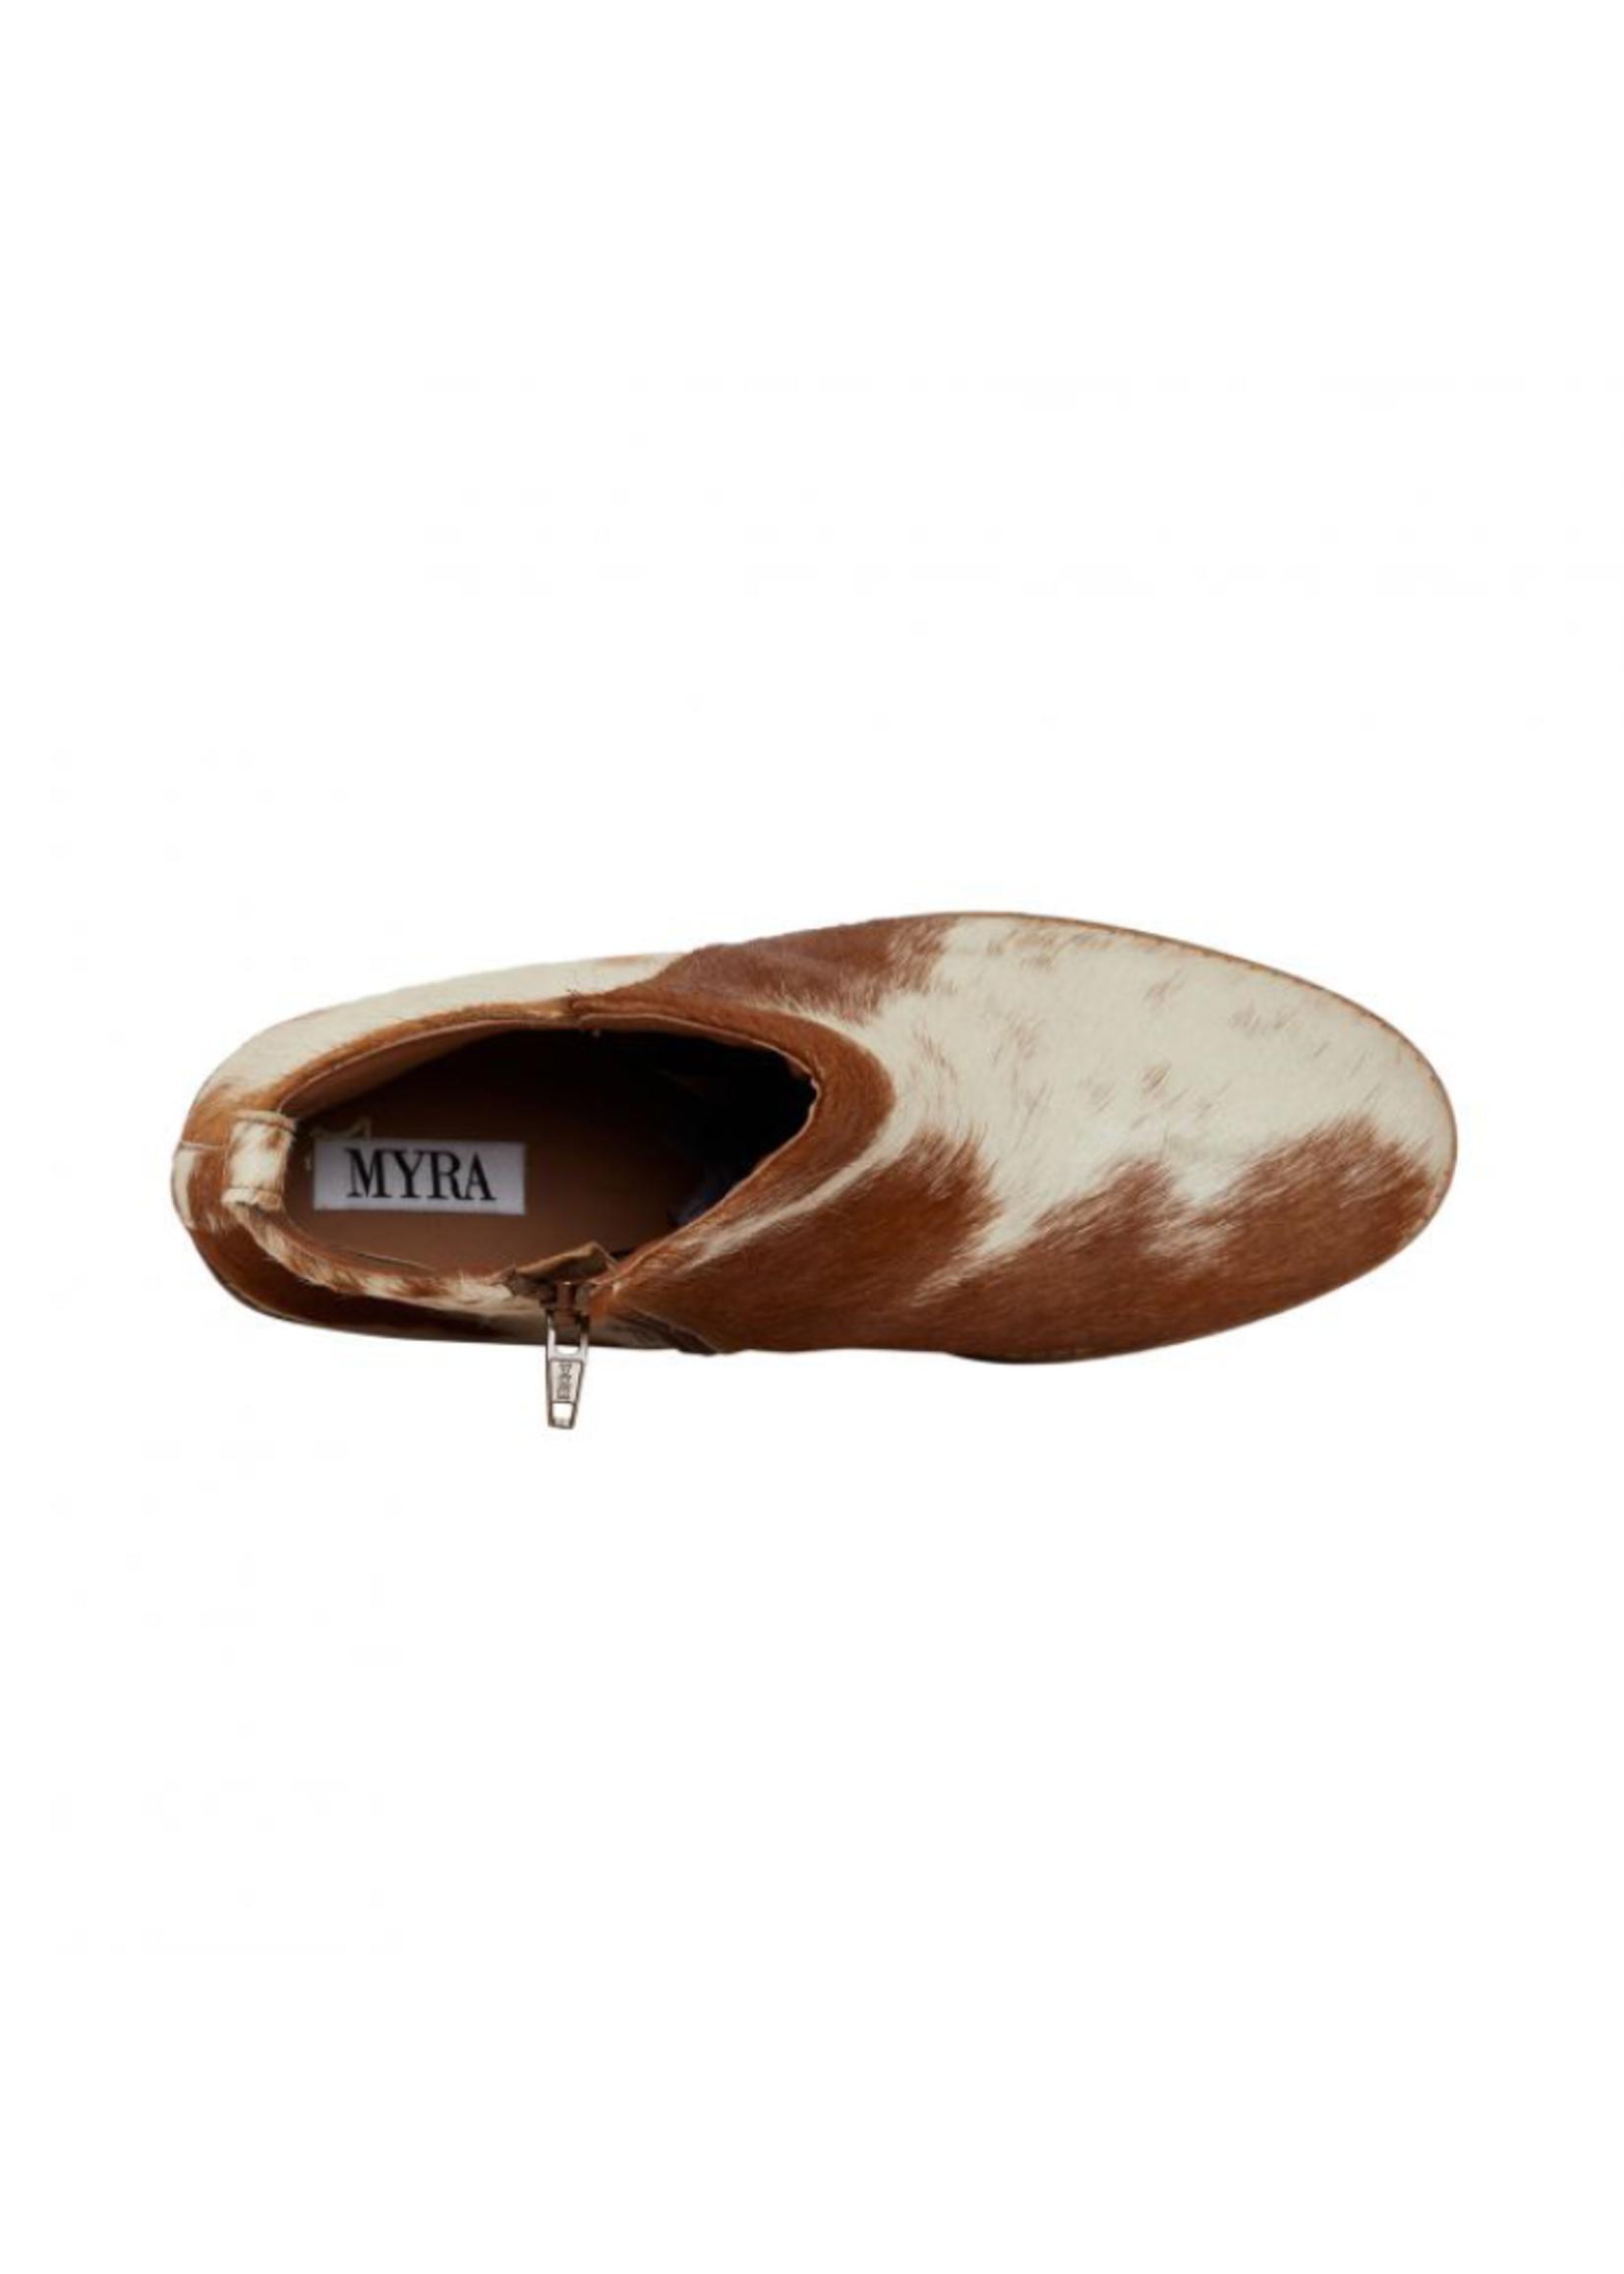 Myra Proton Boots